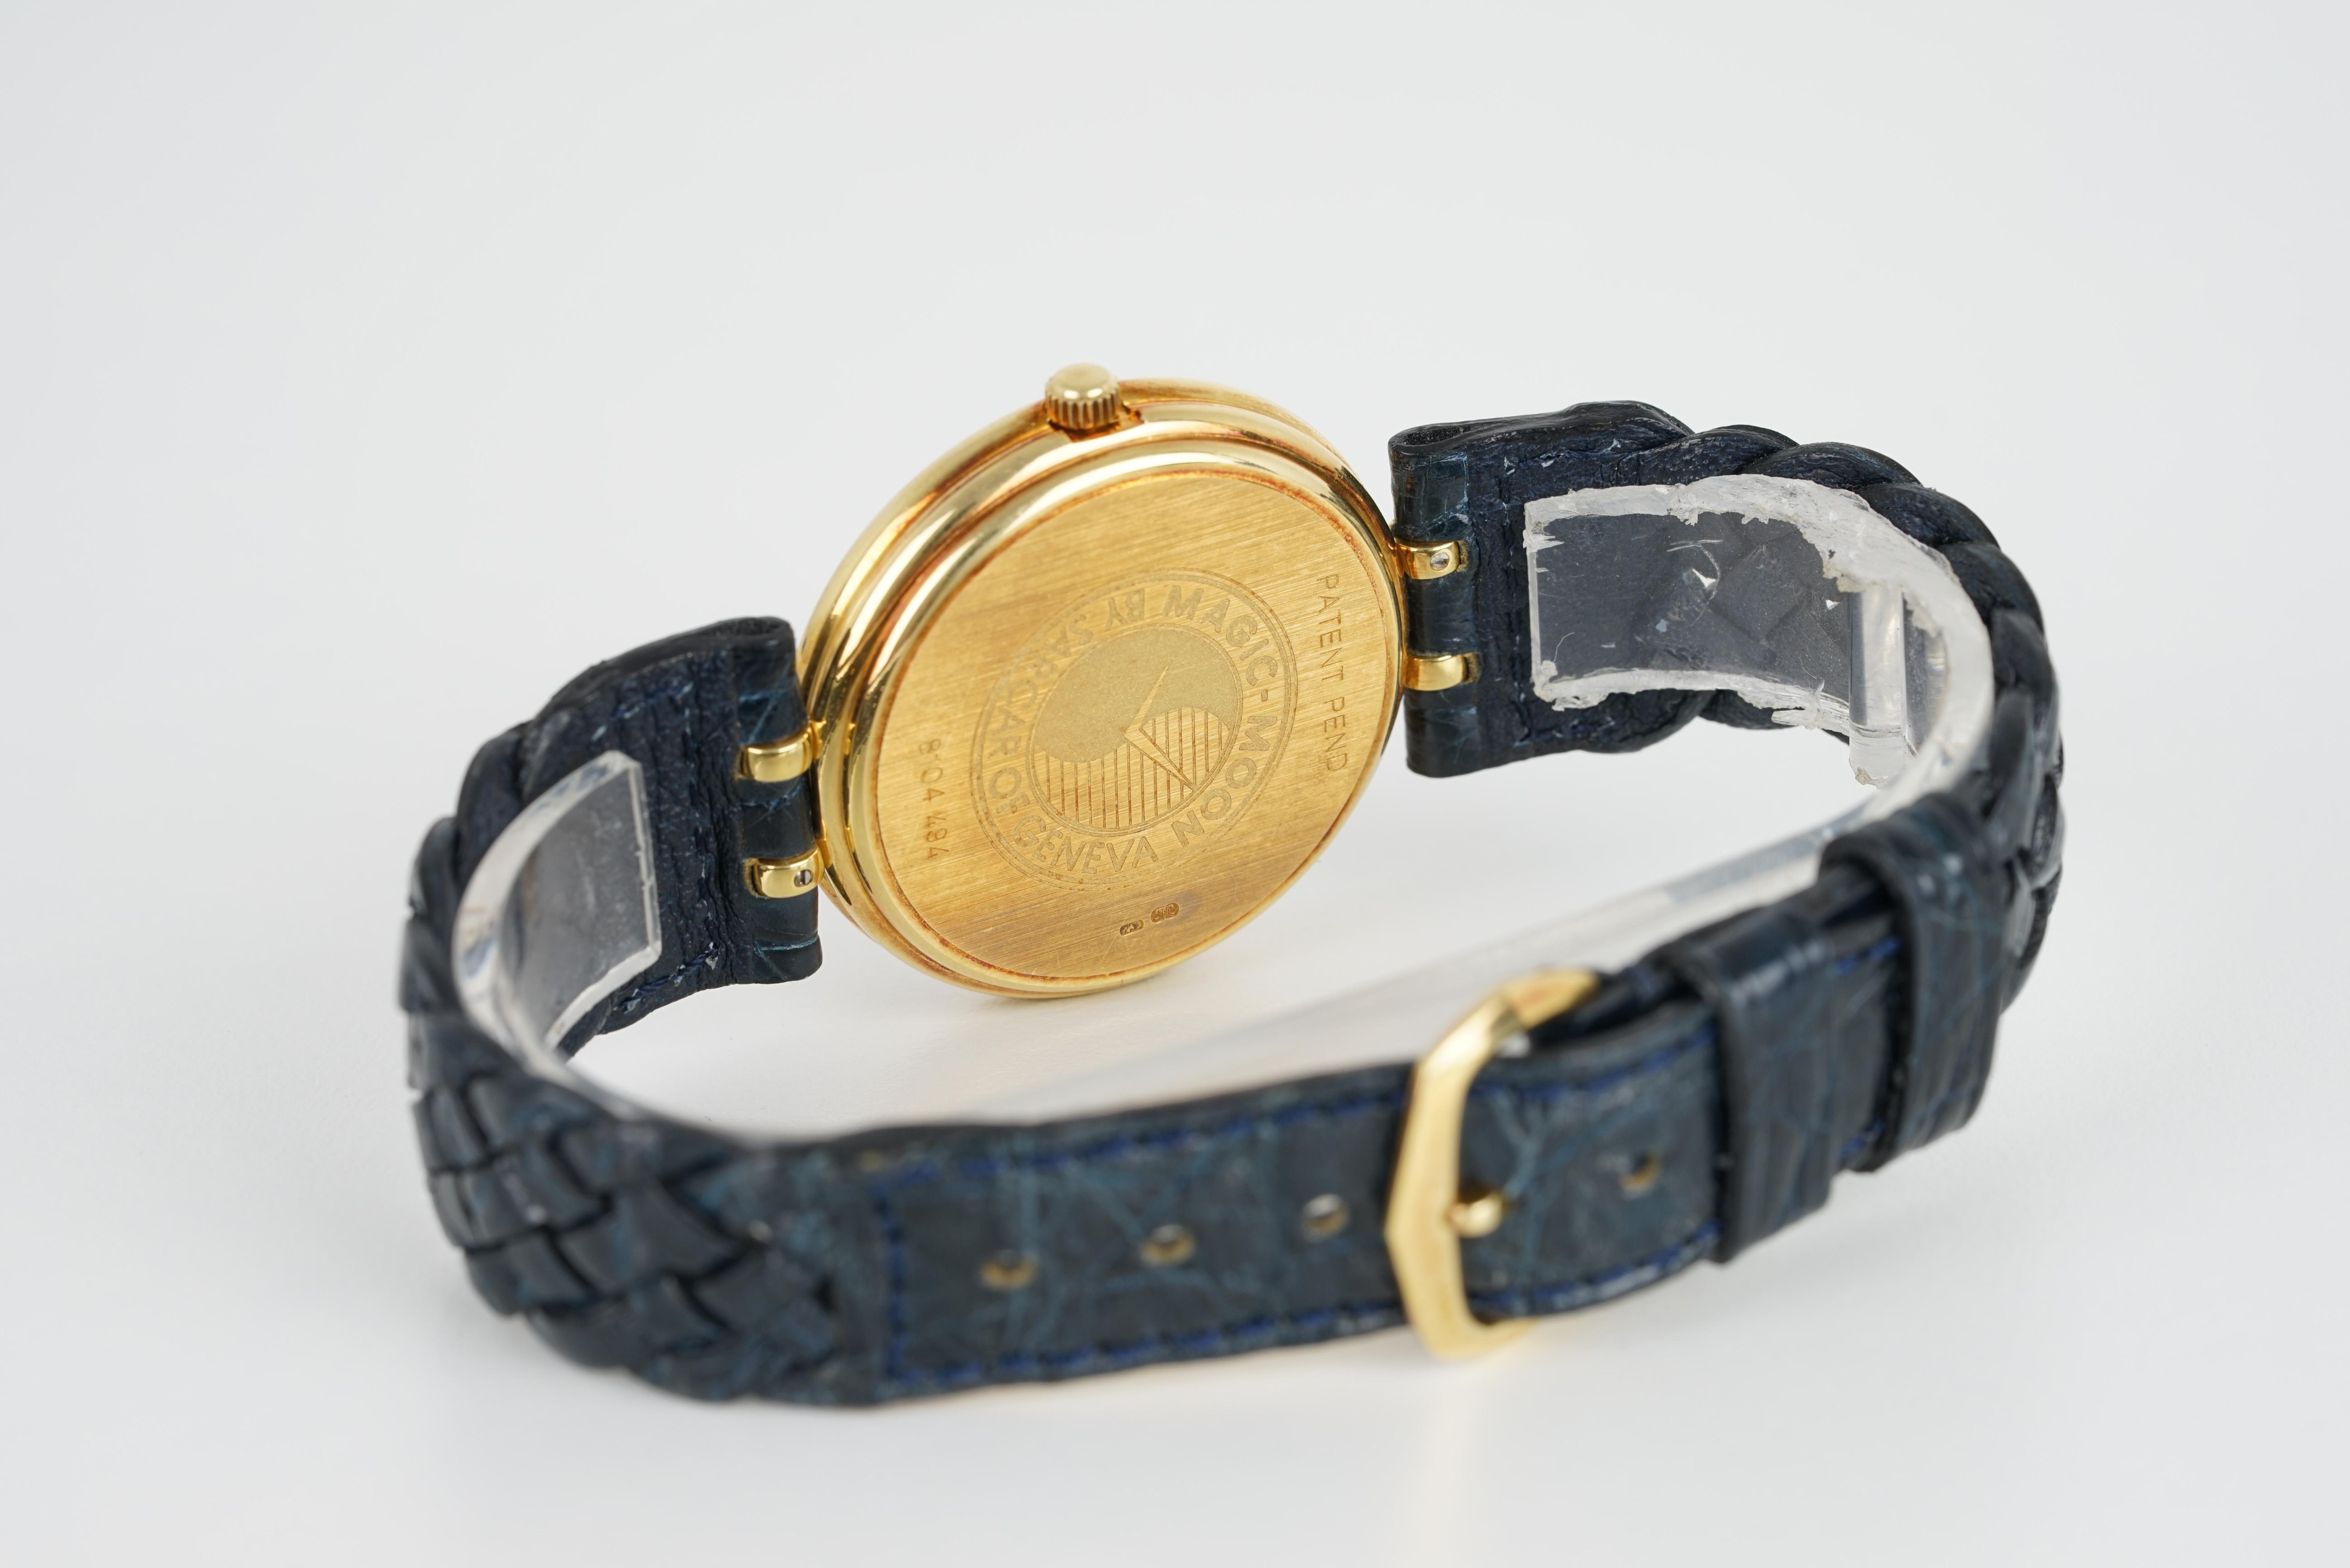 GENTLELMENS SARCAR GENEVE ASPREY 18CT GOLD DIAMOND SET WRISTWATCH, circular dial with dauphine - Image 3 of 3